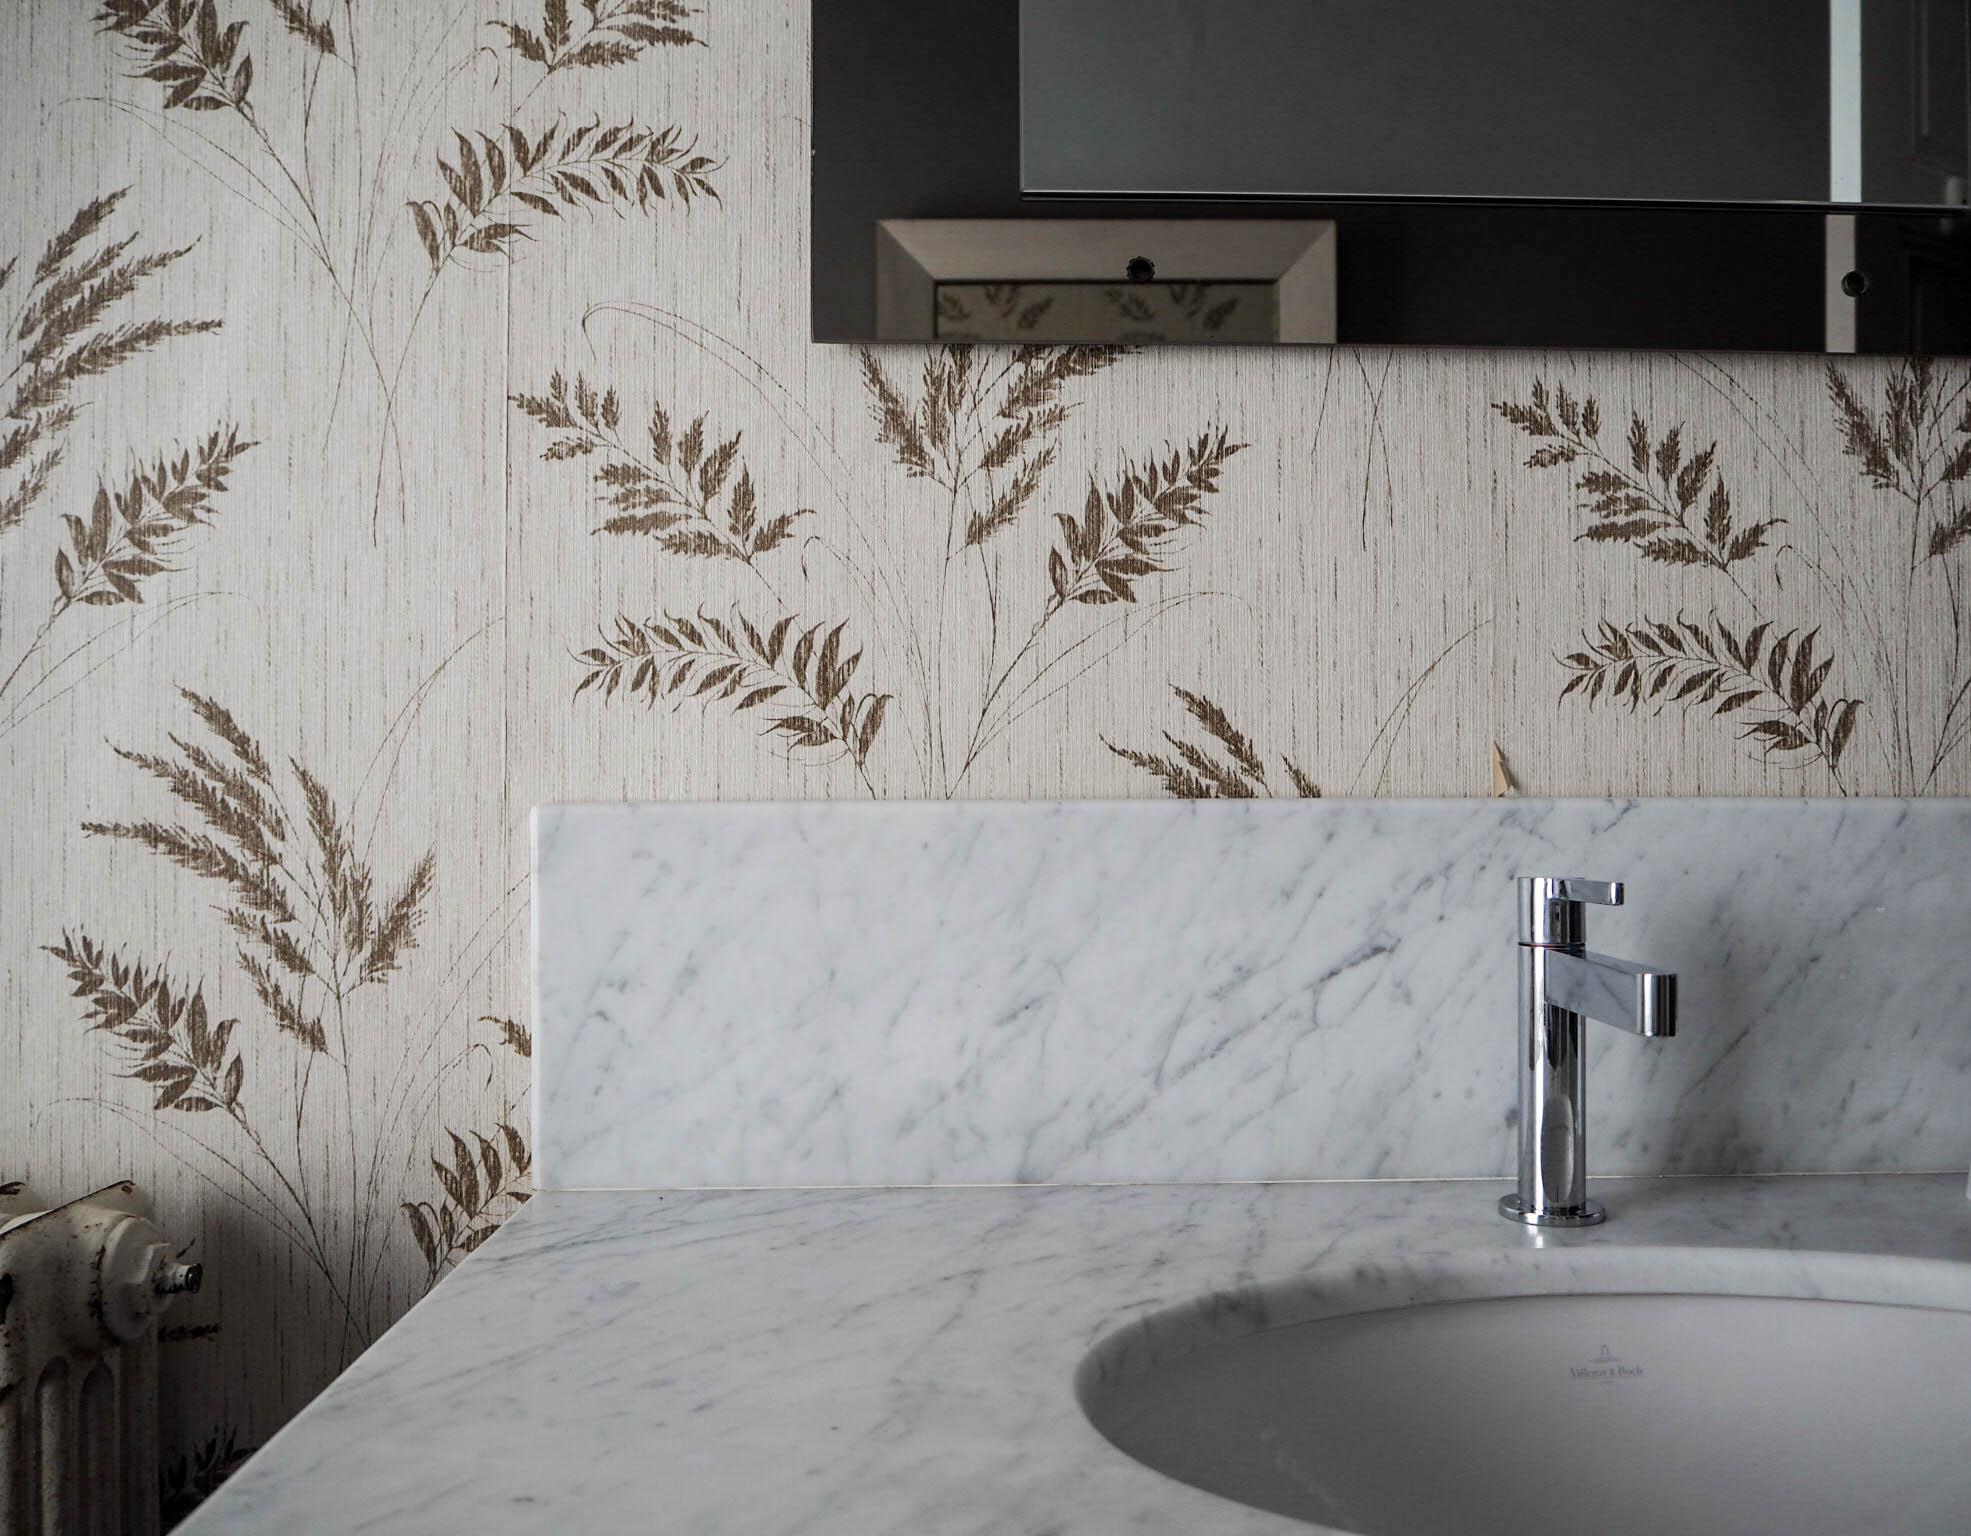 camellas-lloret-maison-d'hotes-room4-wallpaper.jpg